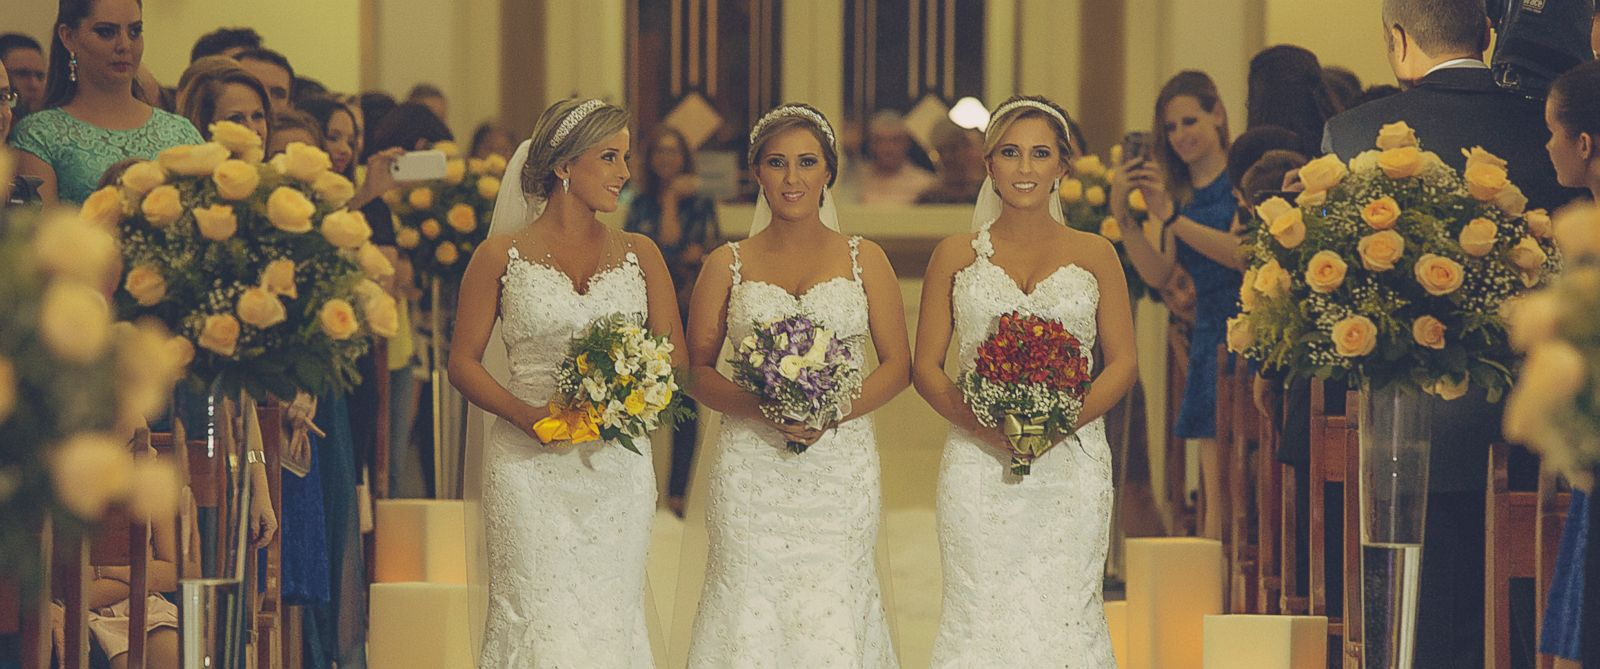 PHOTO: Identical triplets Rafaela Bini, Rocheli Bini and Tagiane Bini got married to their respective husbands together at Catedral Nossa Senhora Aparecida in Passo Fundo, Brazil, March 21, 2015.